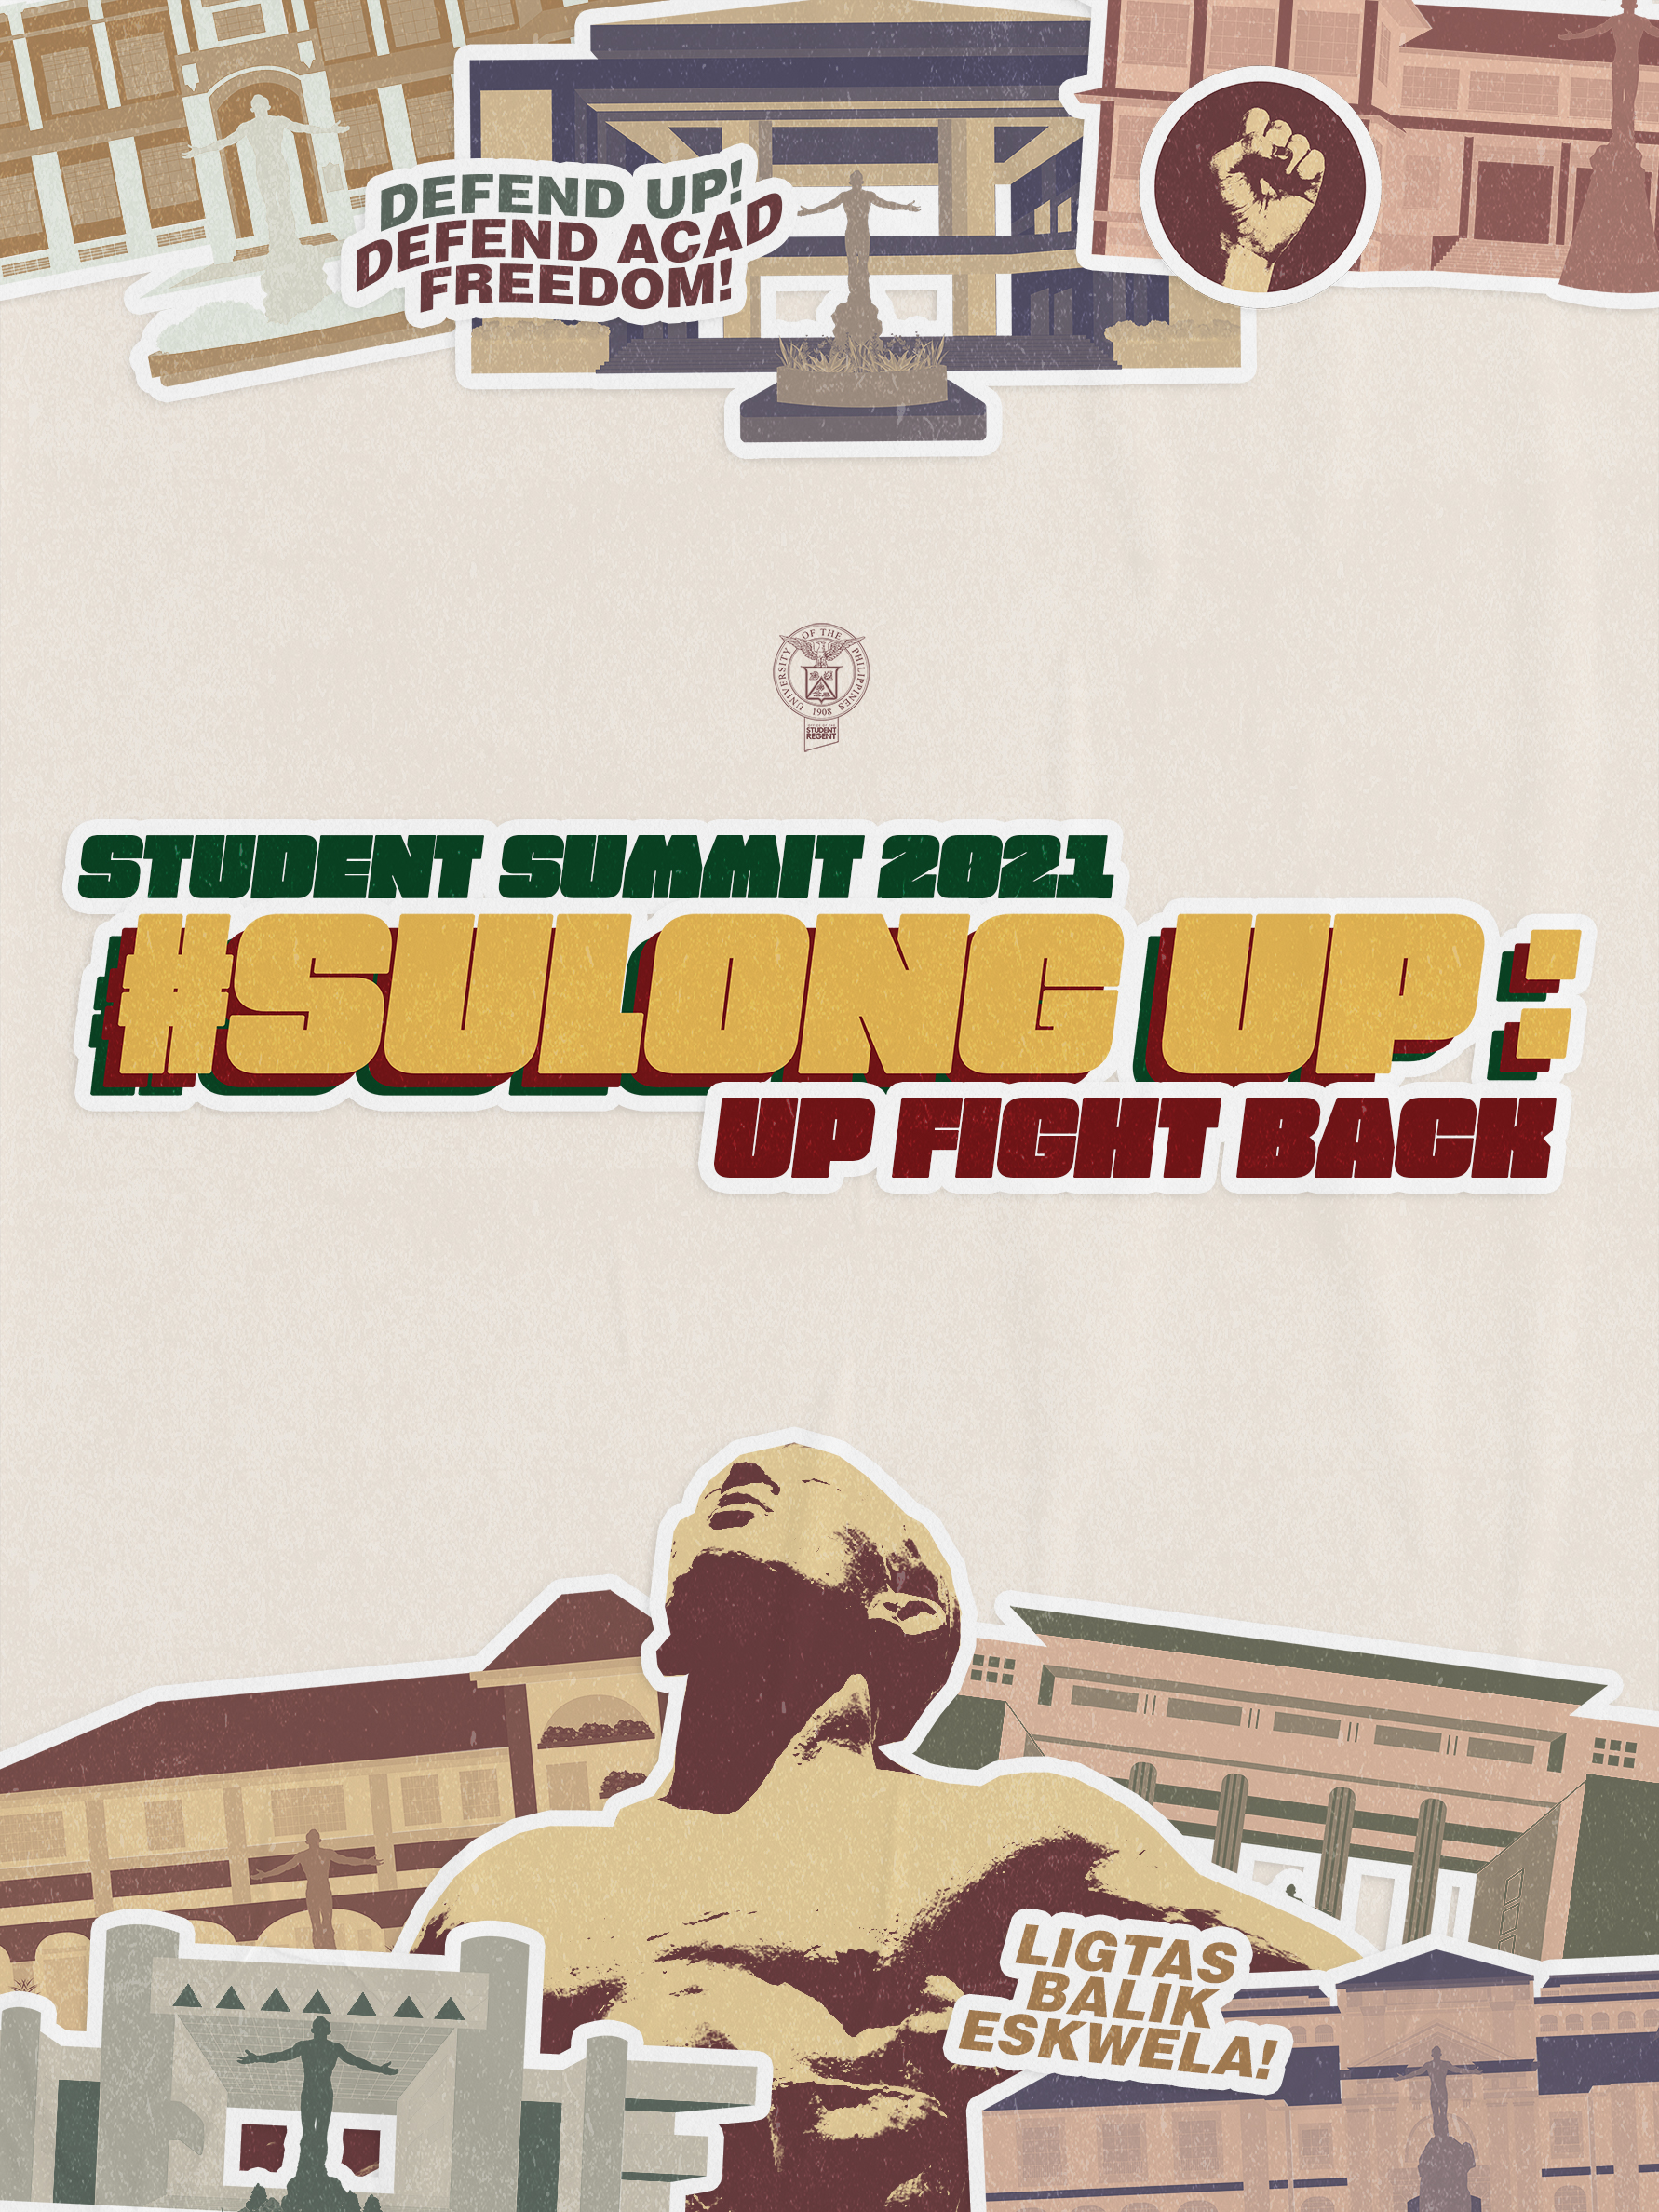 UPOU Student Summit 2021